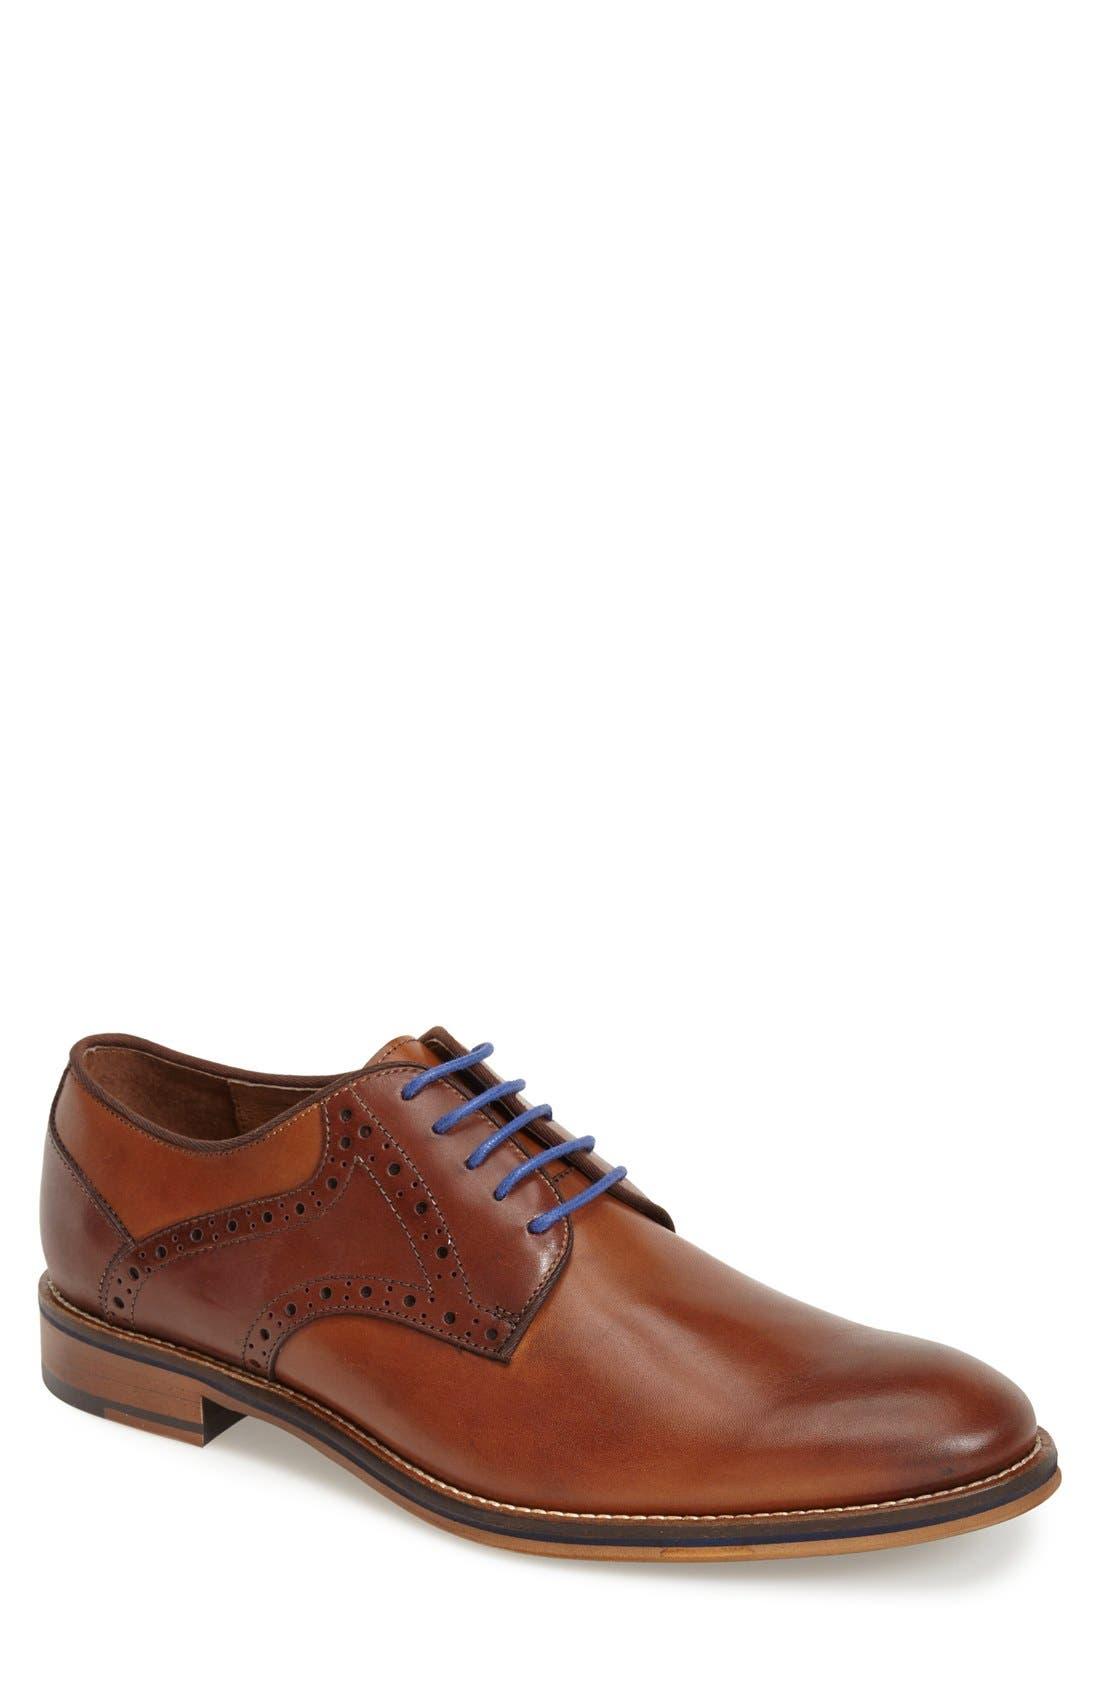 Conard Saddle Shoe,                             Main thumbnail 1, color,                             TAN/ DARK BROWN